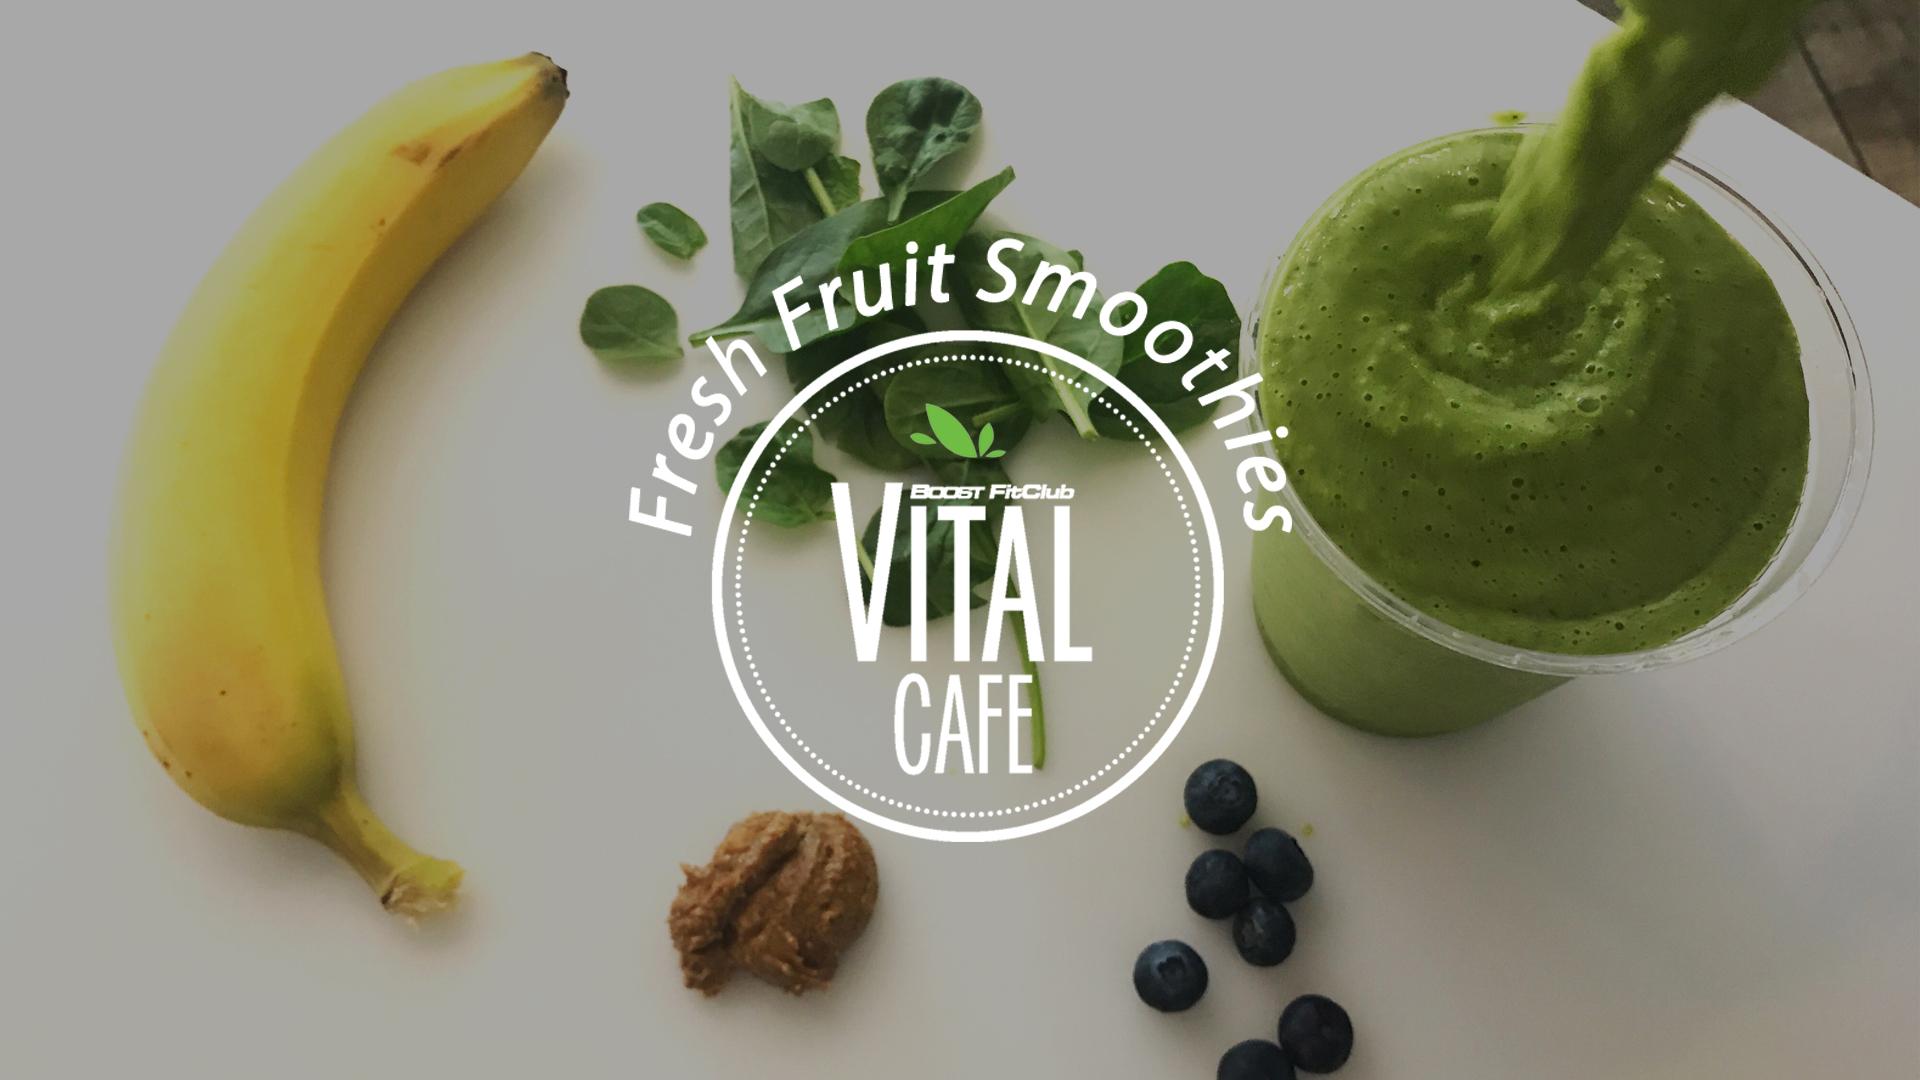 Vital Cafe